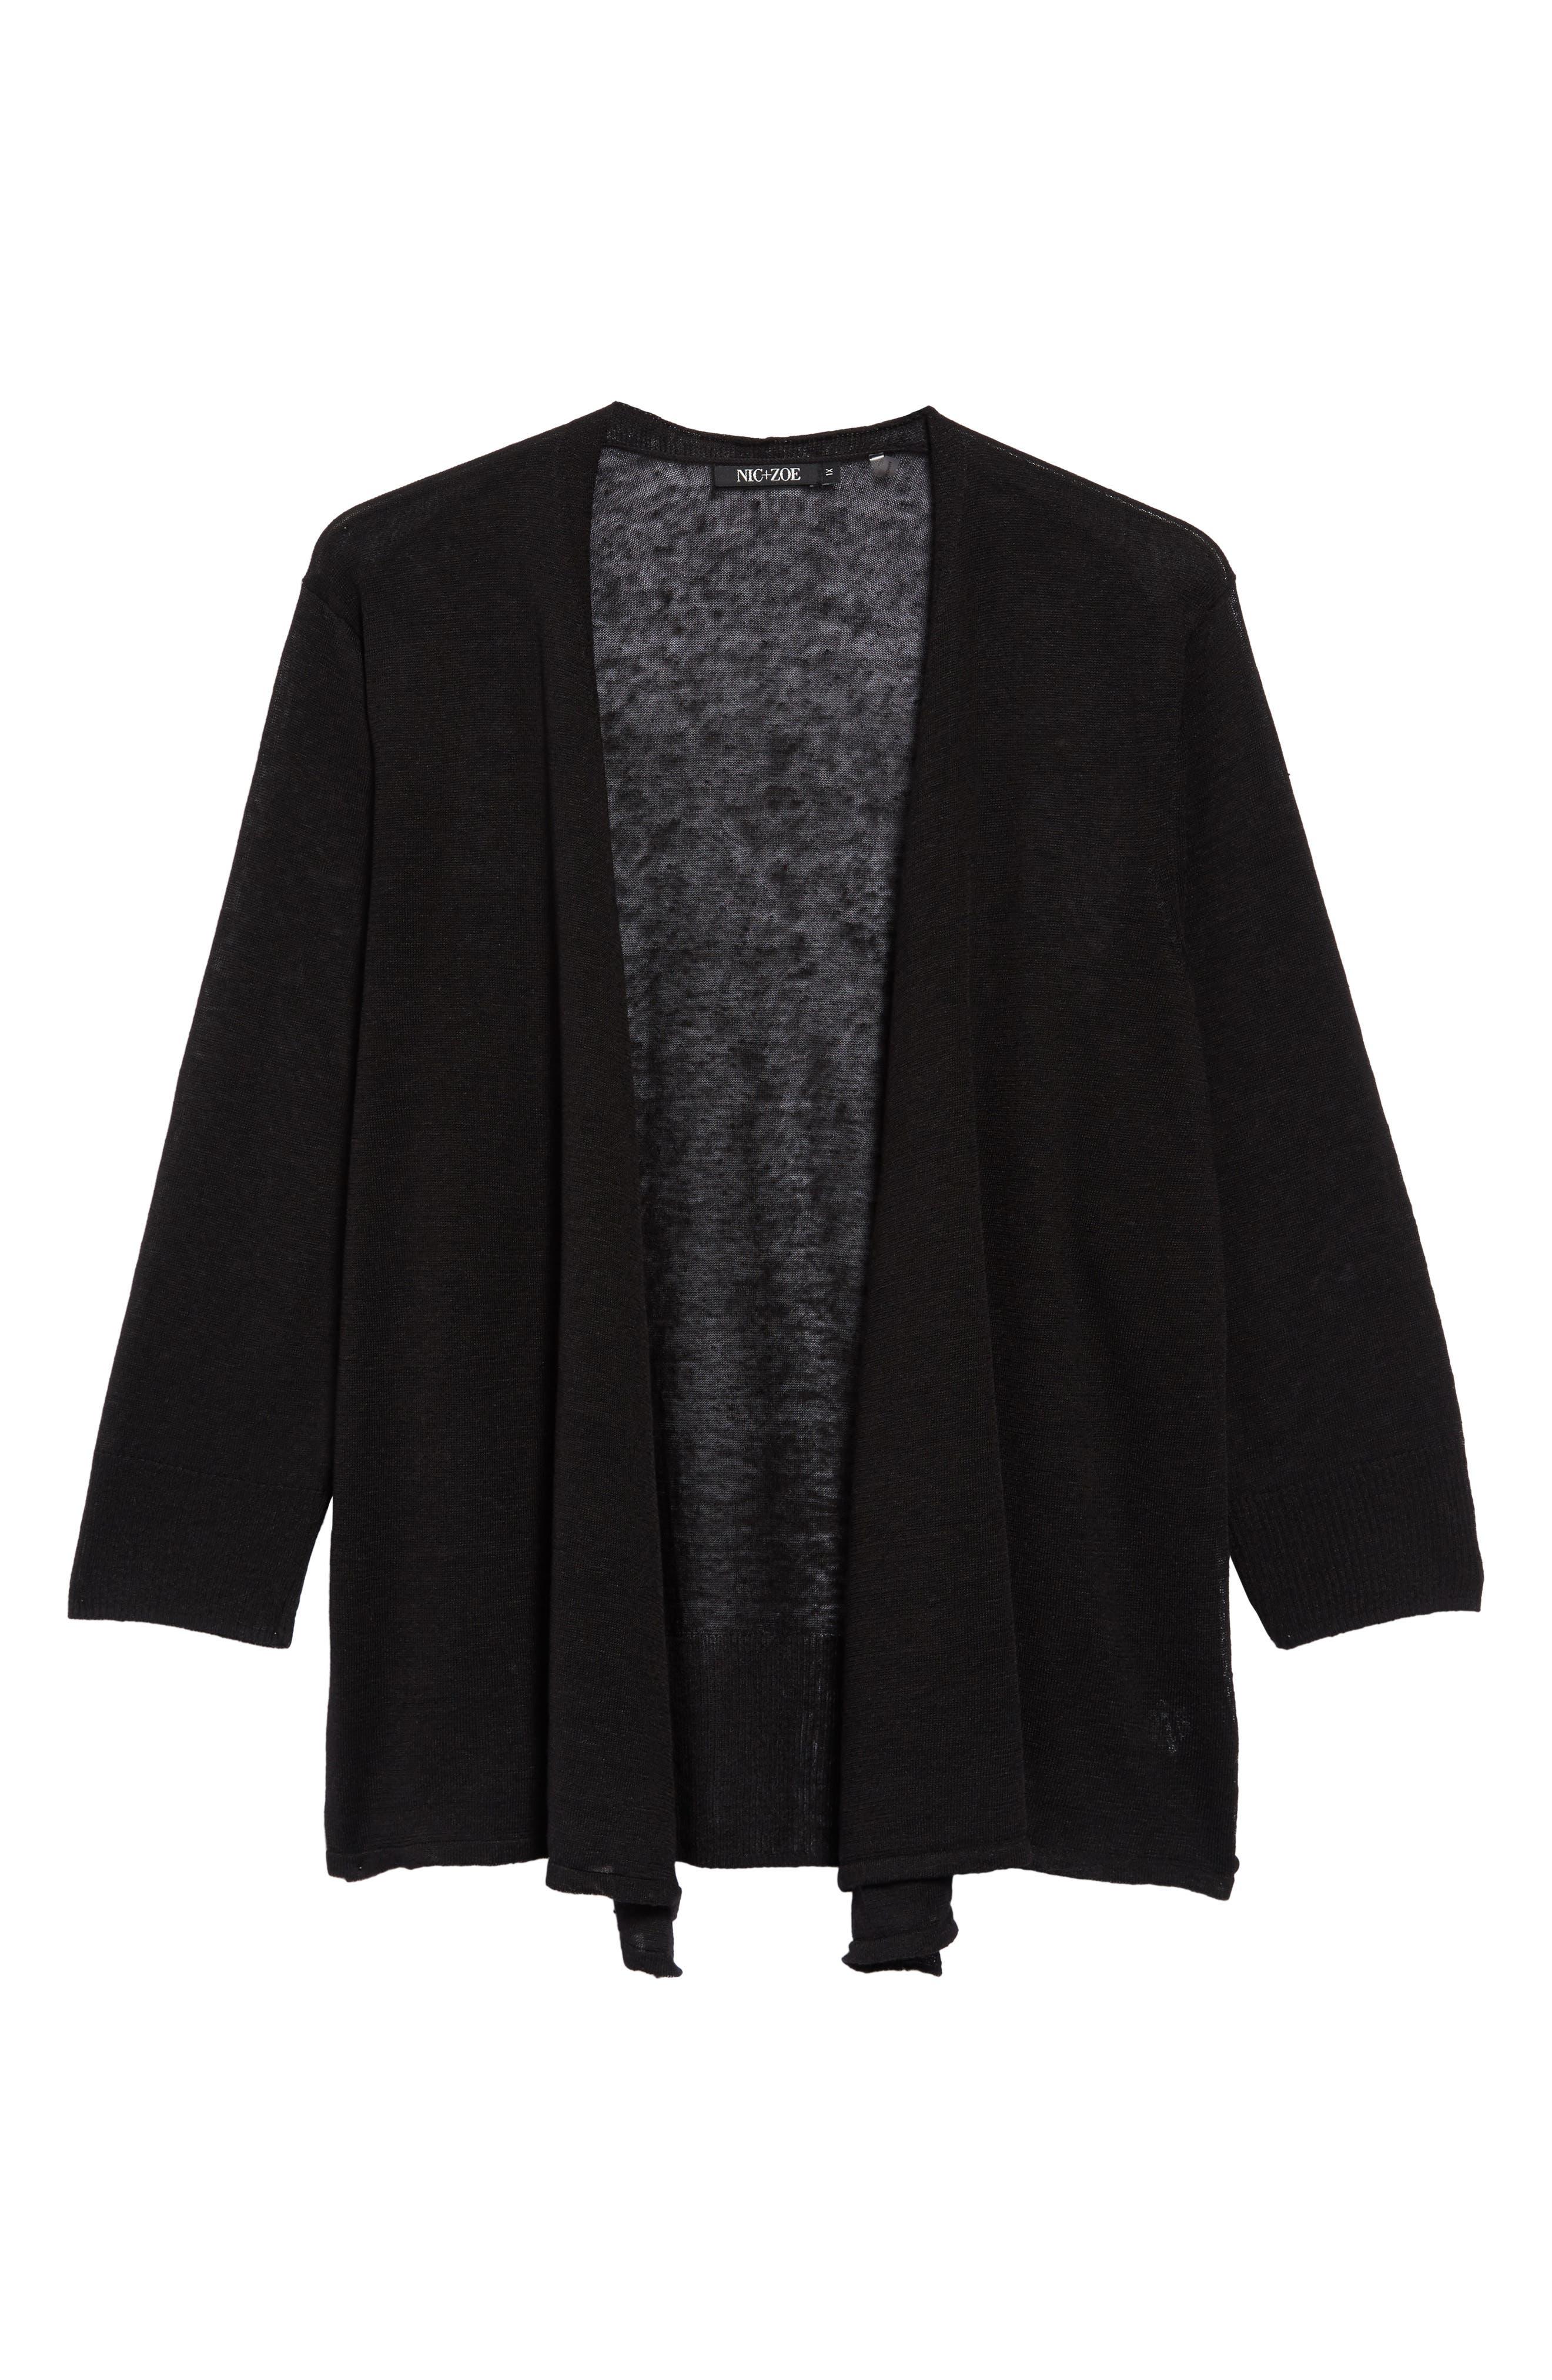 '4-Way' Three Quarter Sleeve Convertible Cardigan,                             Alternate thumbnail 2, color,                             BLACK ONYX